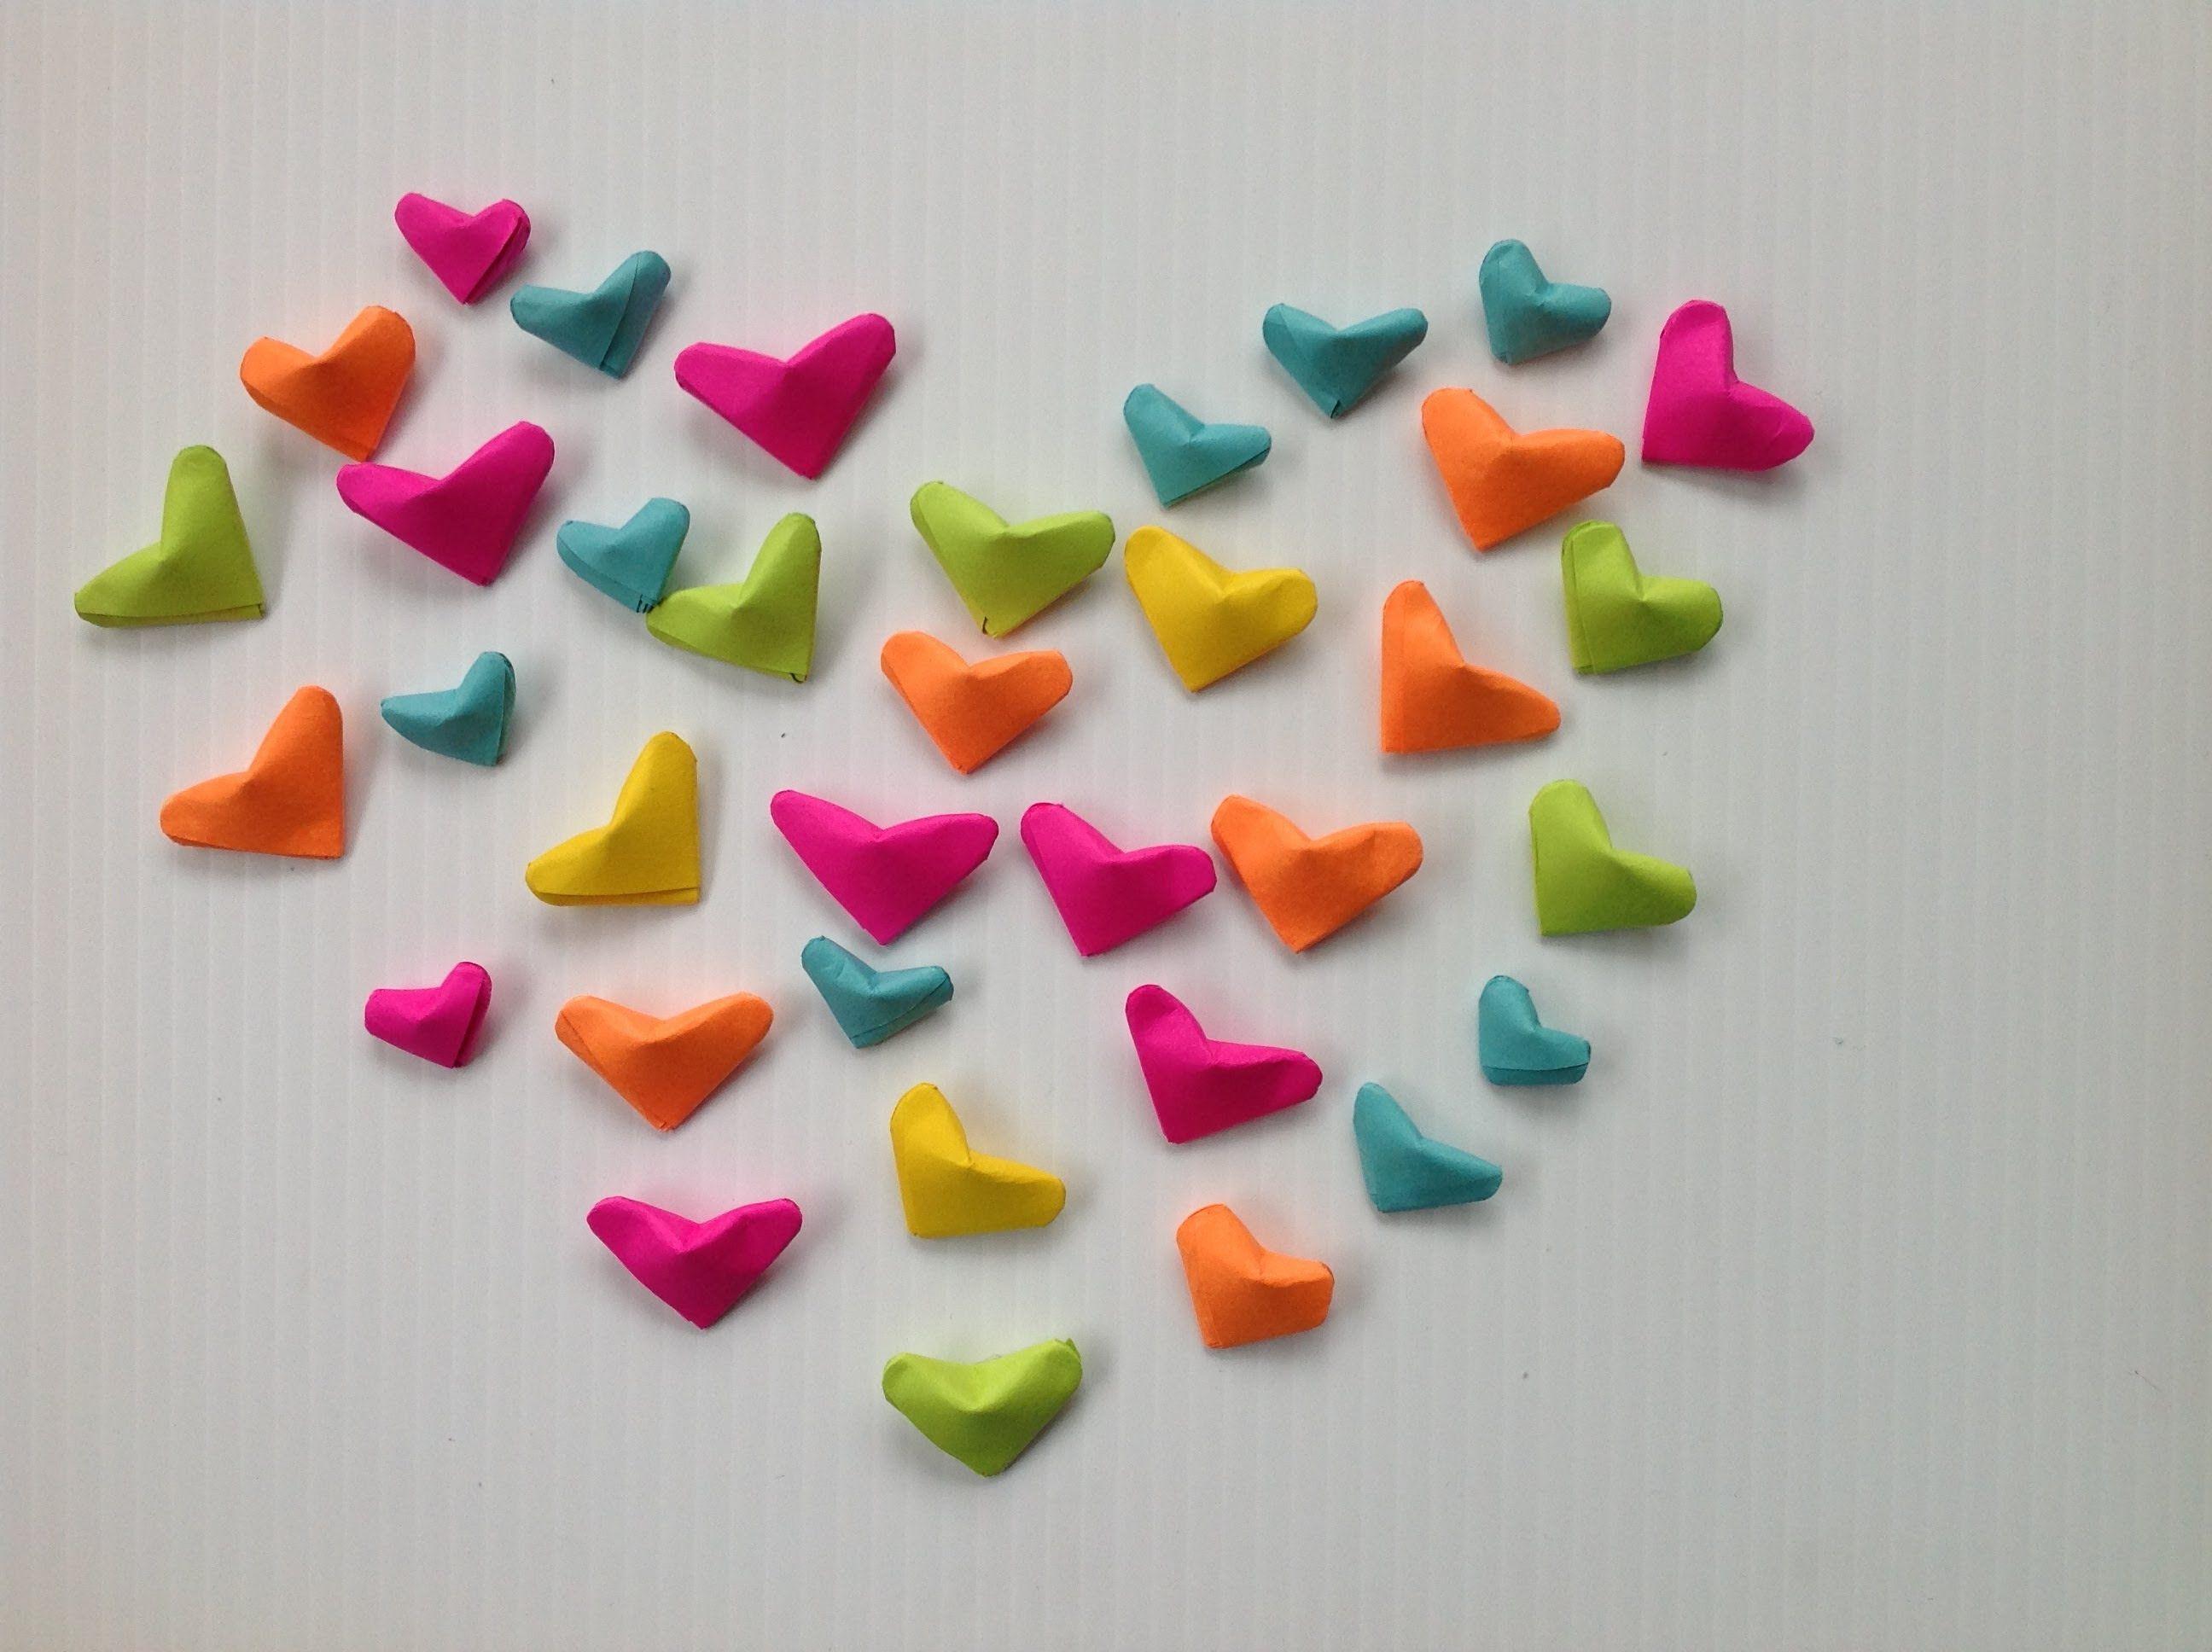 Corazones inflados de papel inflated paper hearts - Papel decorativo manualidades ...